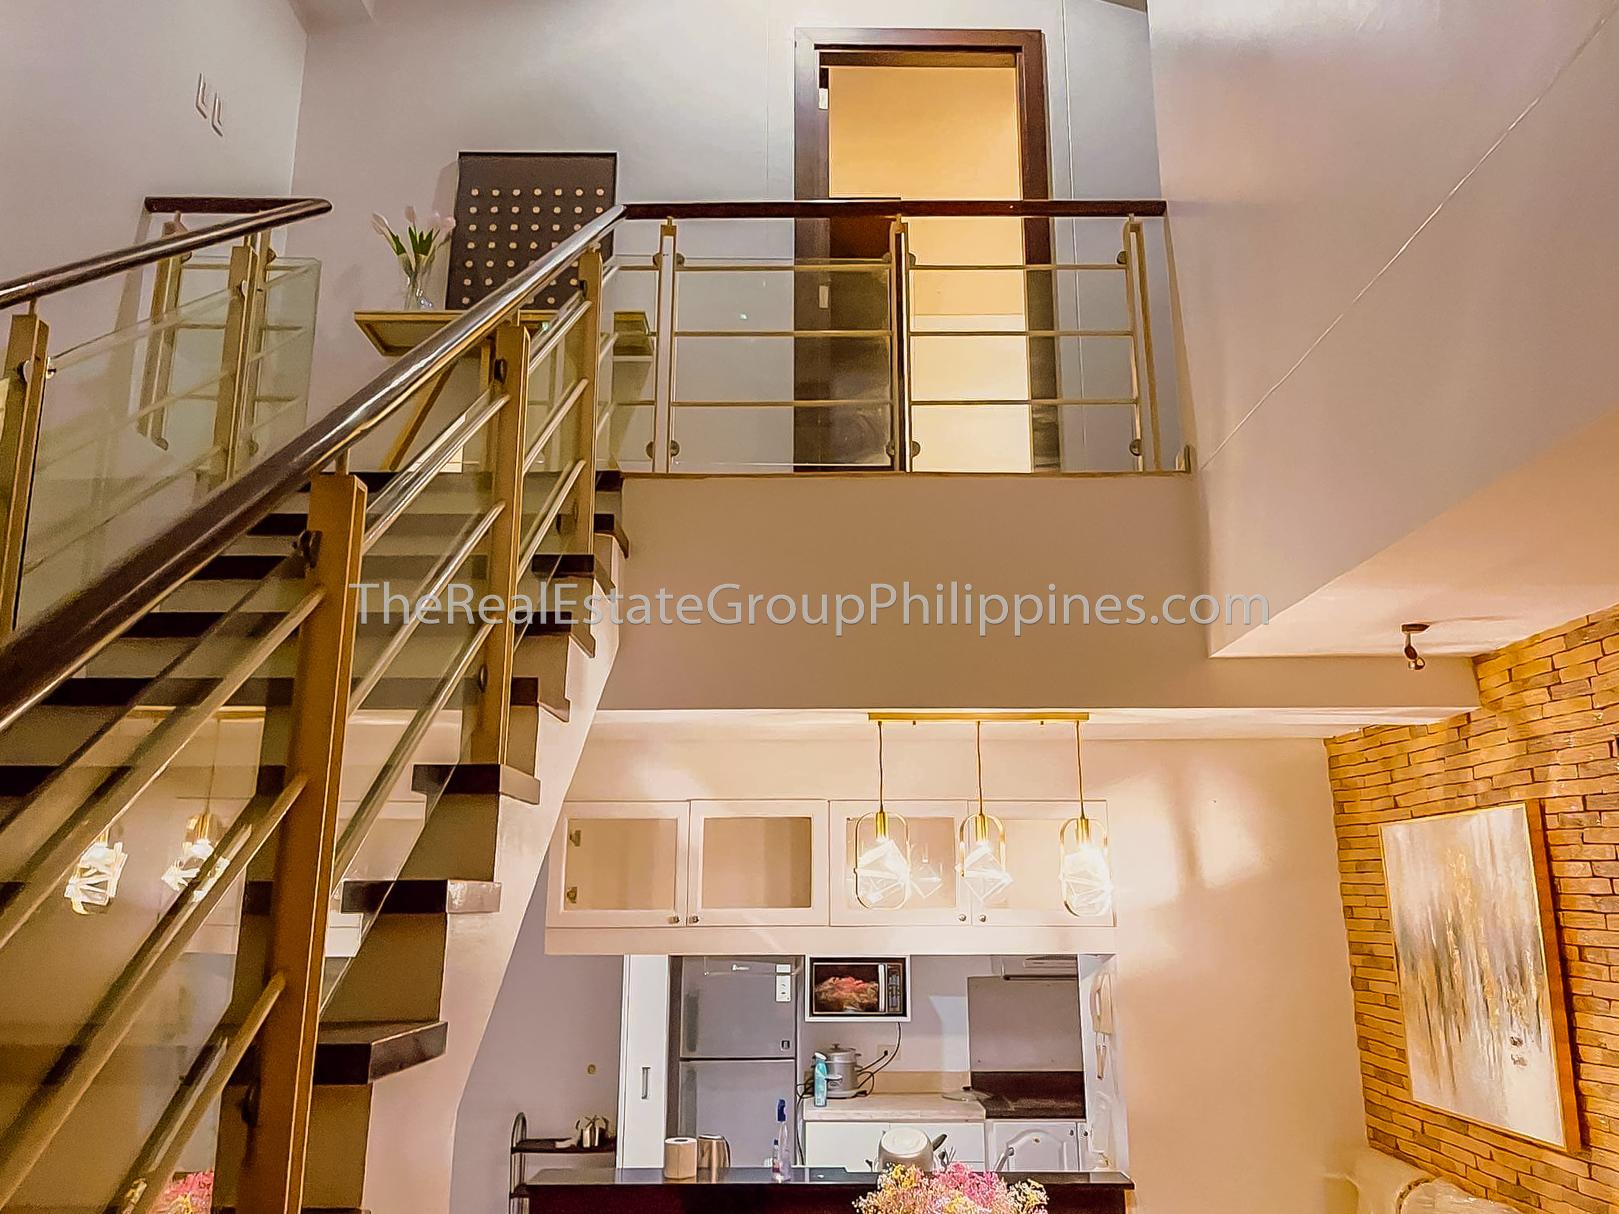 3 Bedroom Condominium For Sale BGC, Three Bedroom Condo For Sale Fort Residences, 3 BR Condo For Sale BGC Taguig, 3BR Condo For Sale Burgos Circle BGC7